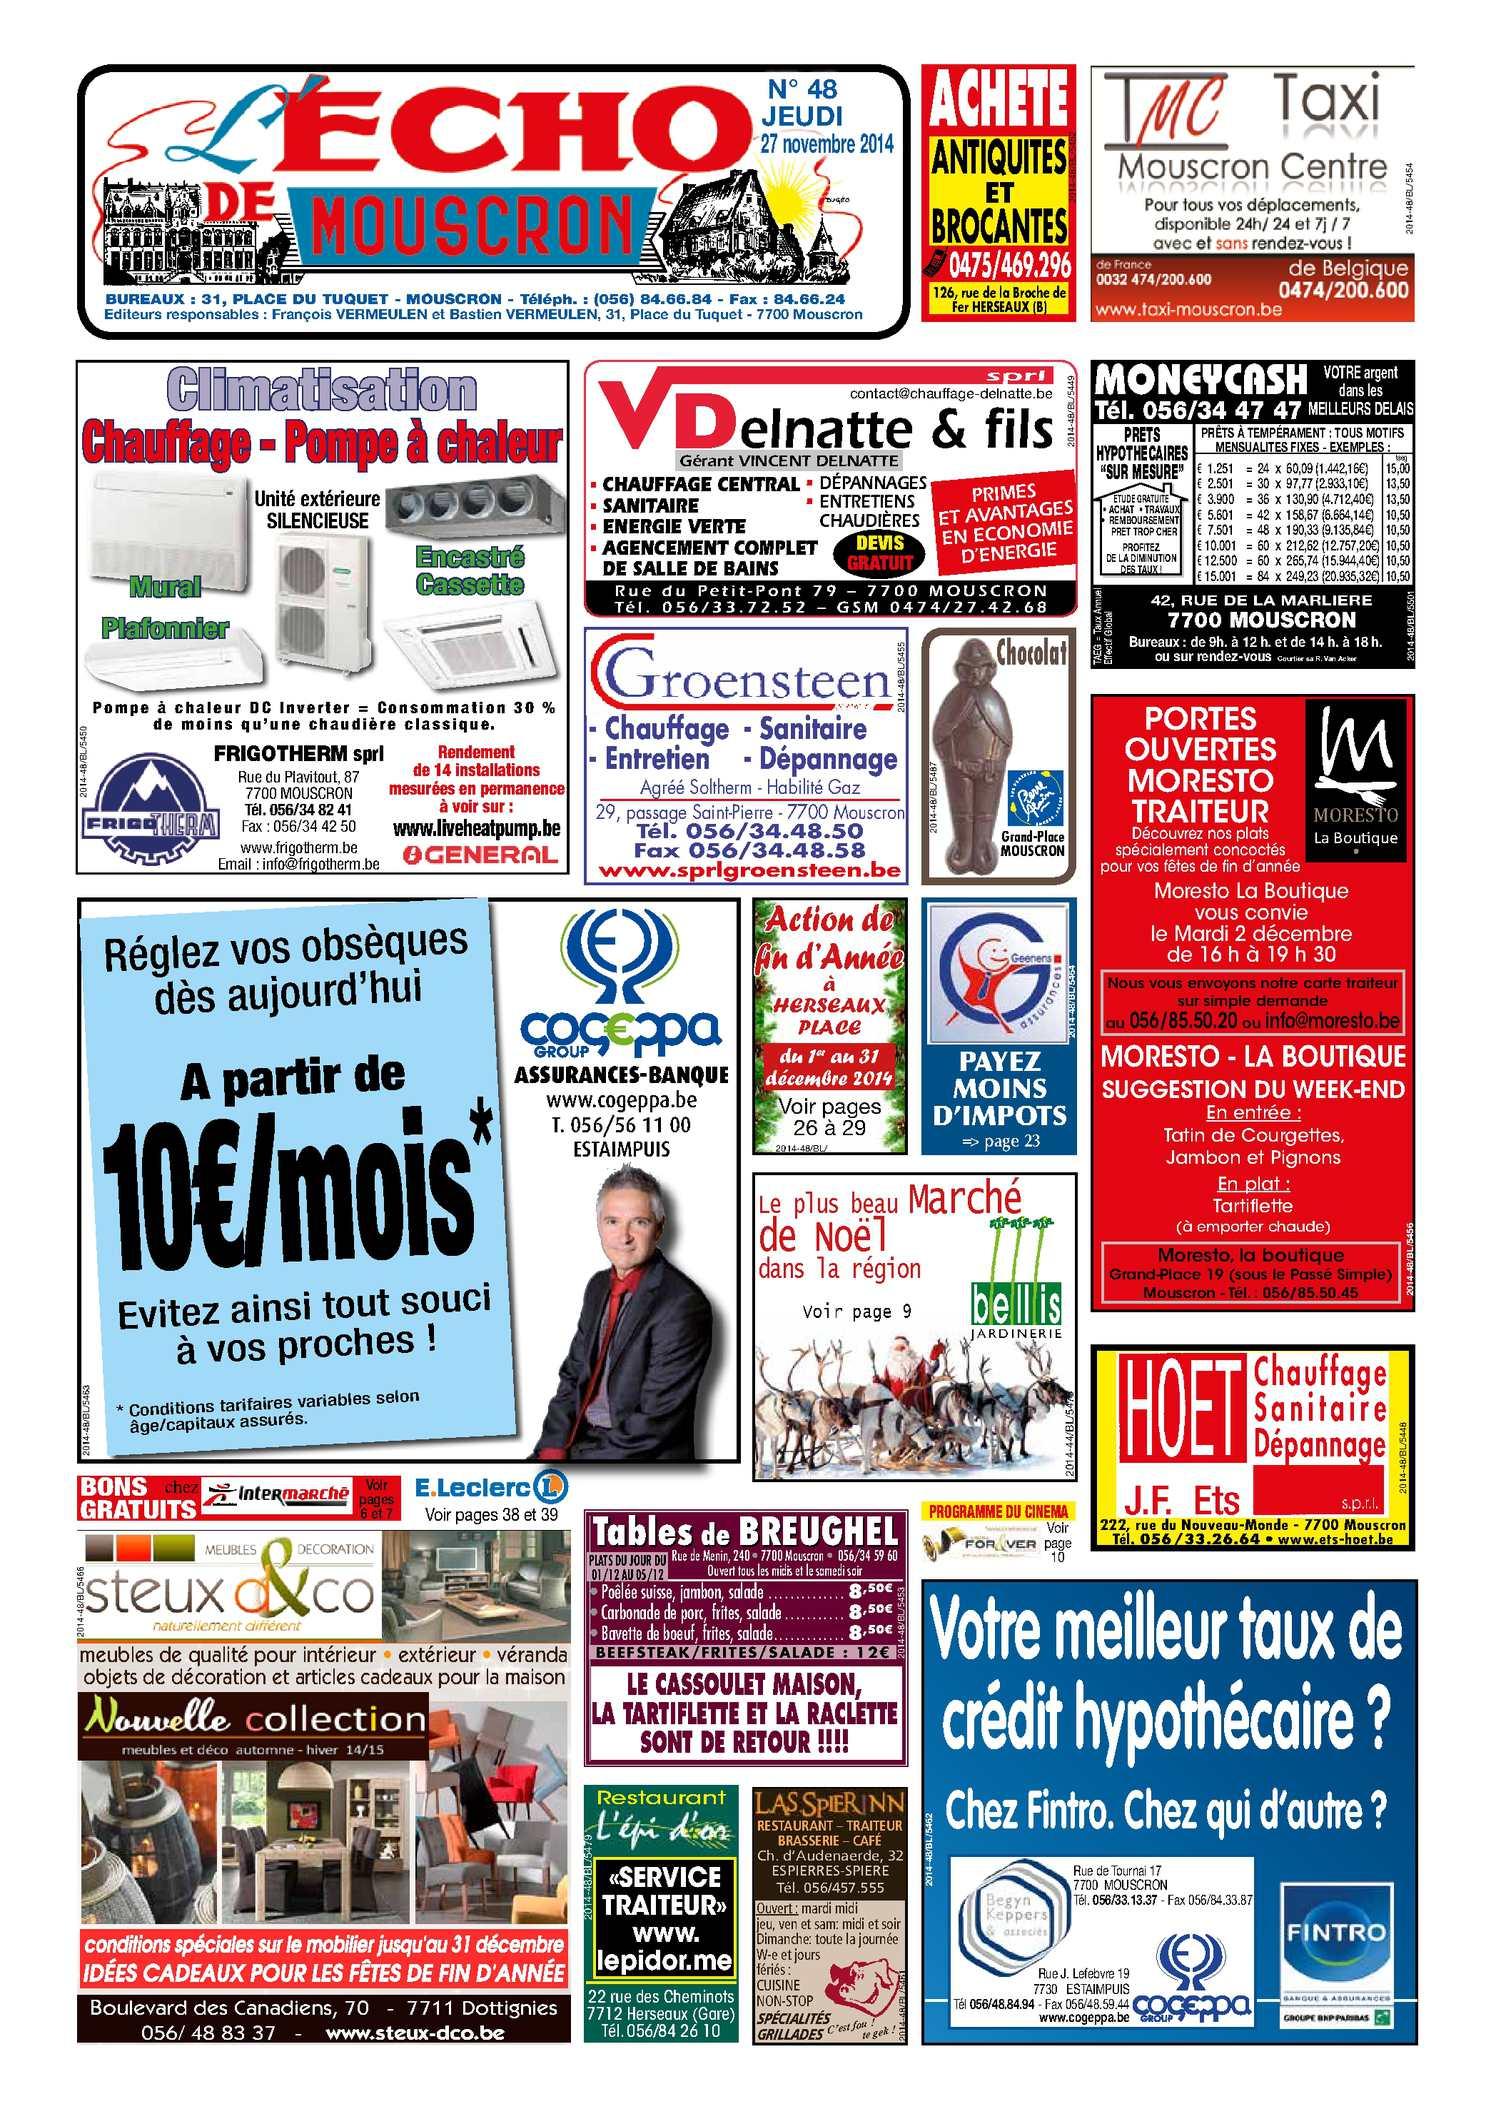 Menu De Noel Leclerc Luxe Calaméo 48 2014 Of 37 Élégant Menu De Noel Leclerc